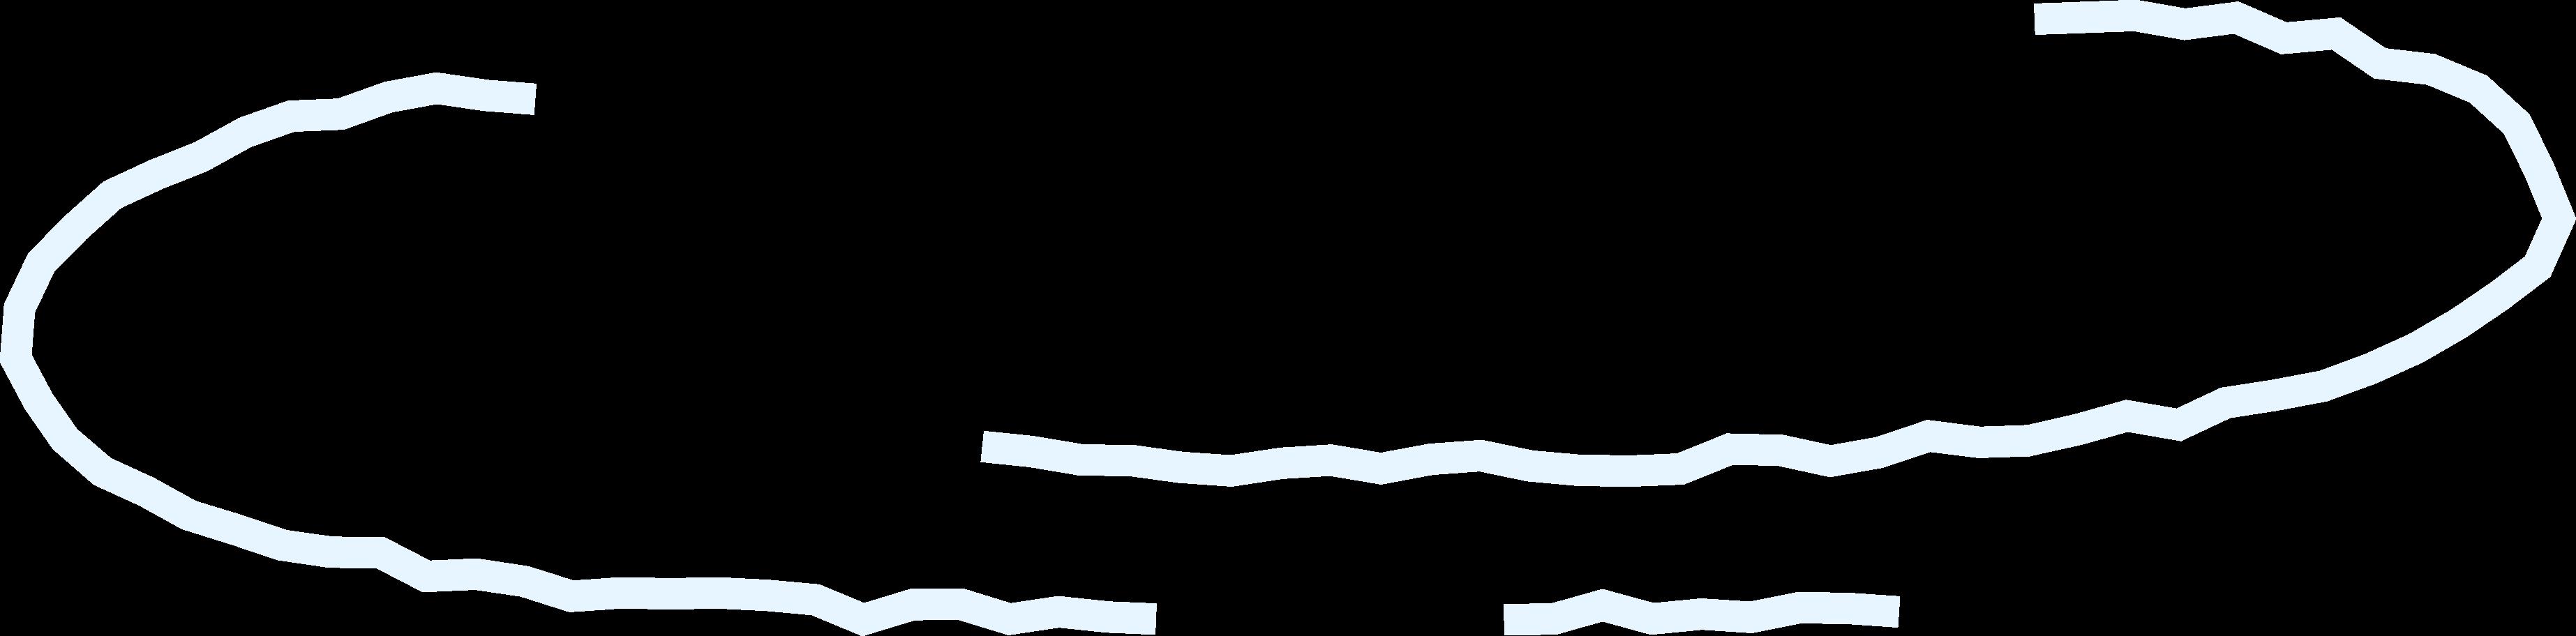 waves Clipart illustration in PNG, SVG